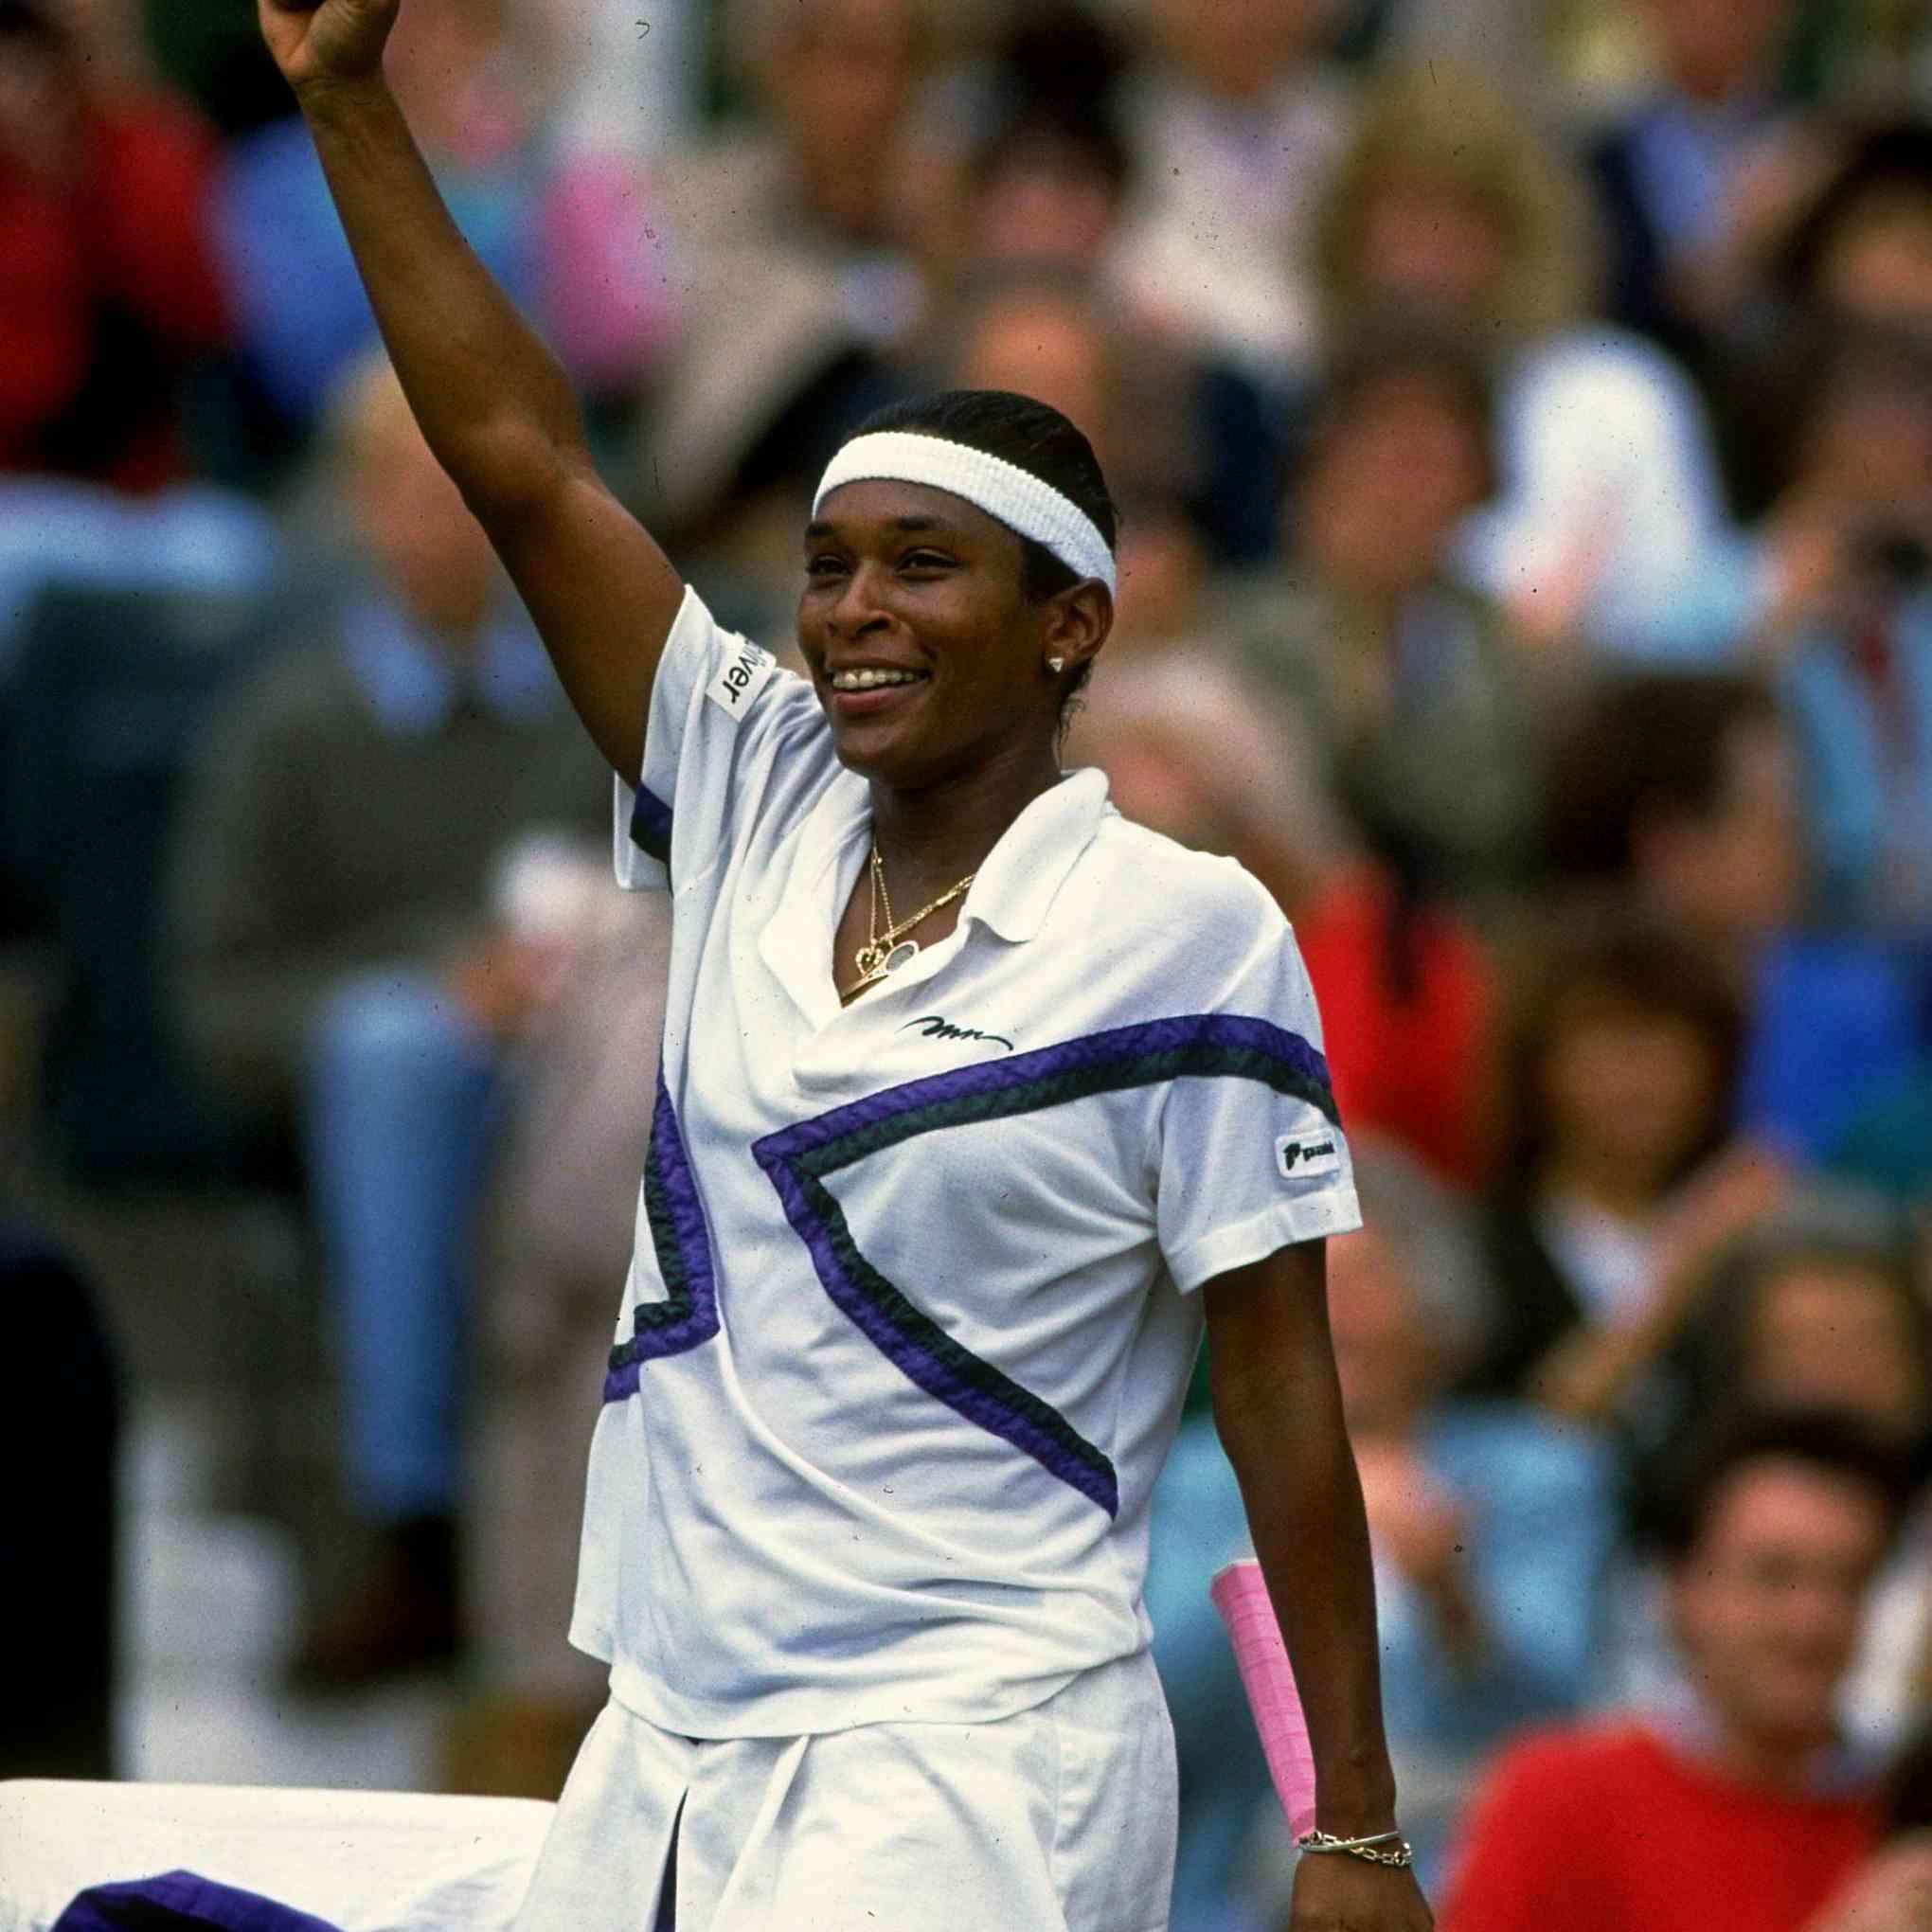 Zina Garrison at Wimbledon, 1990